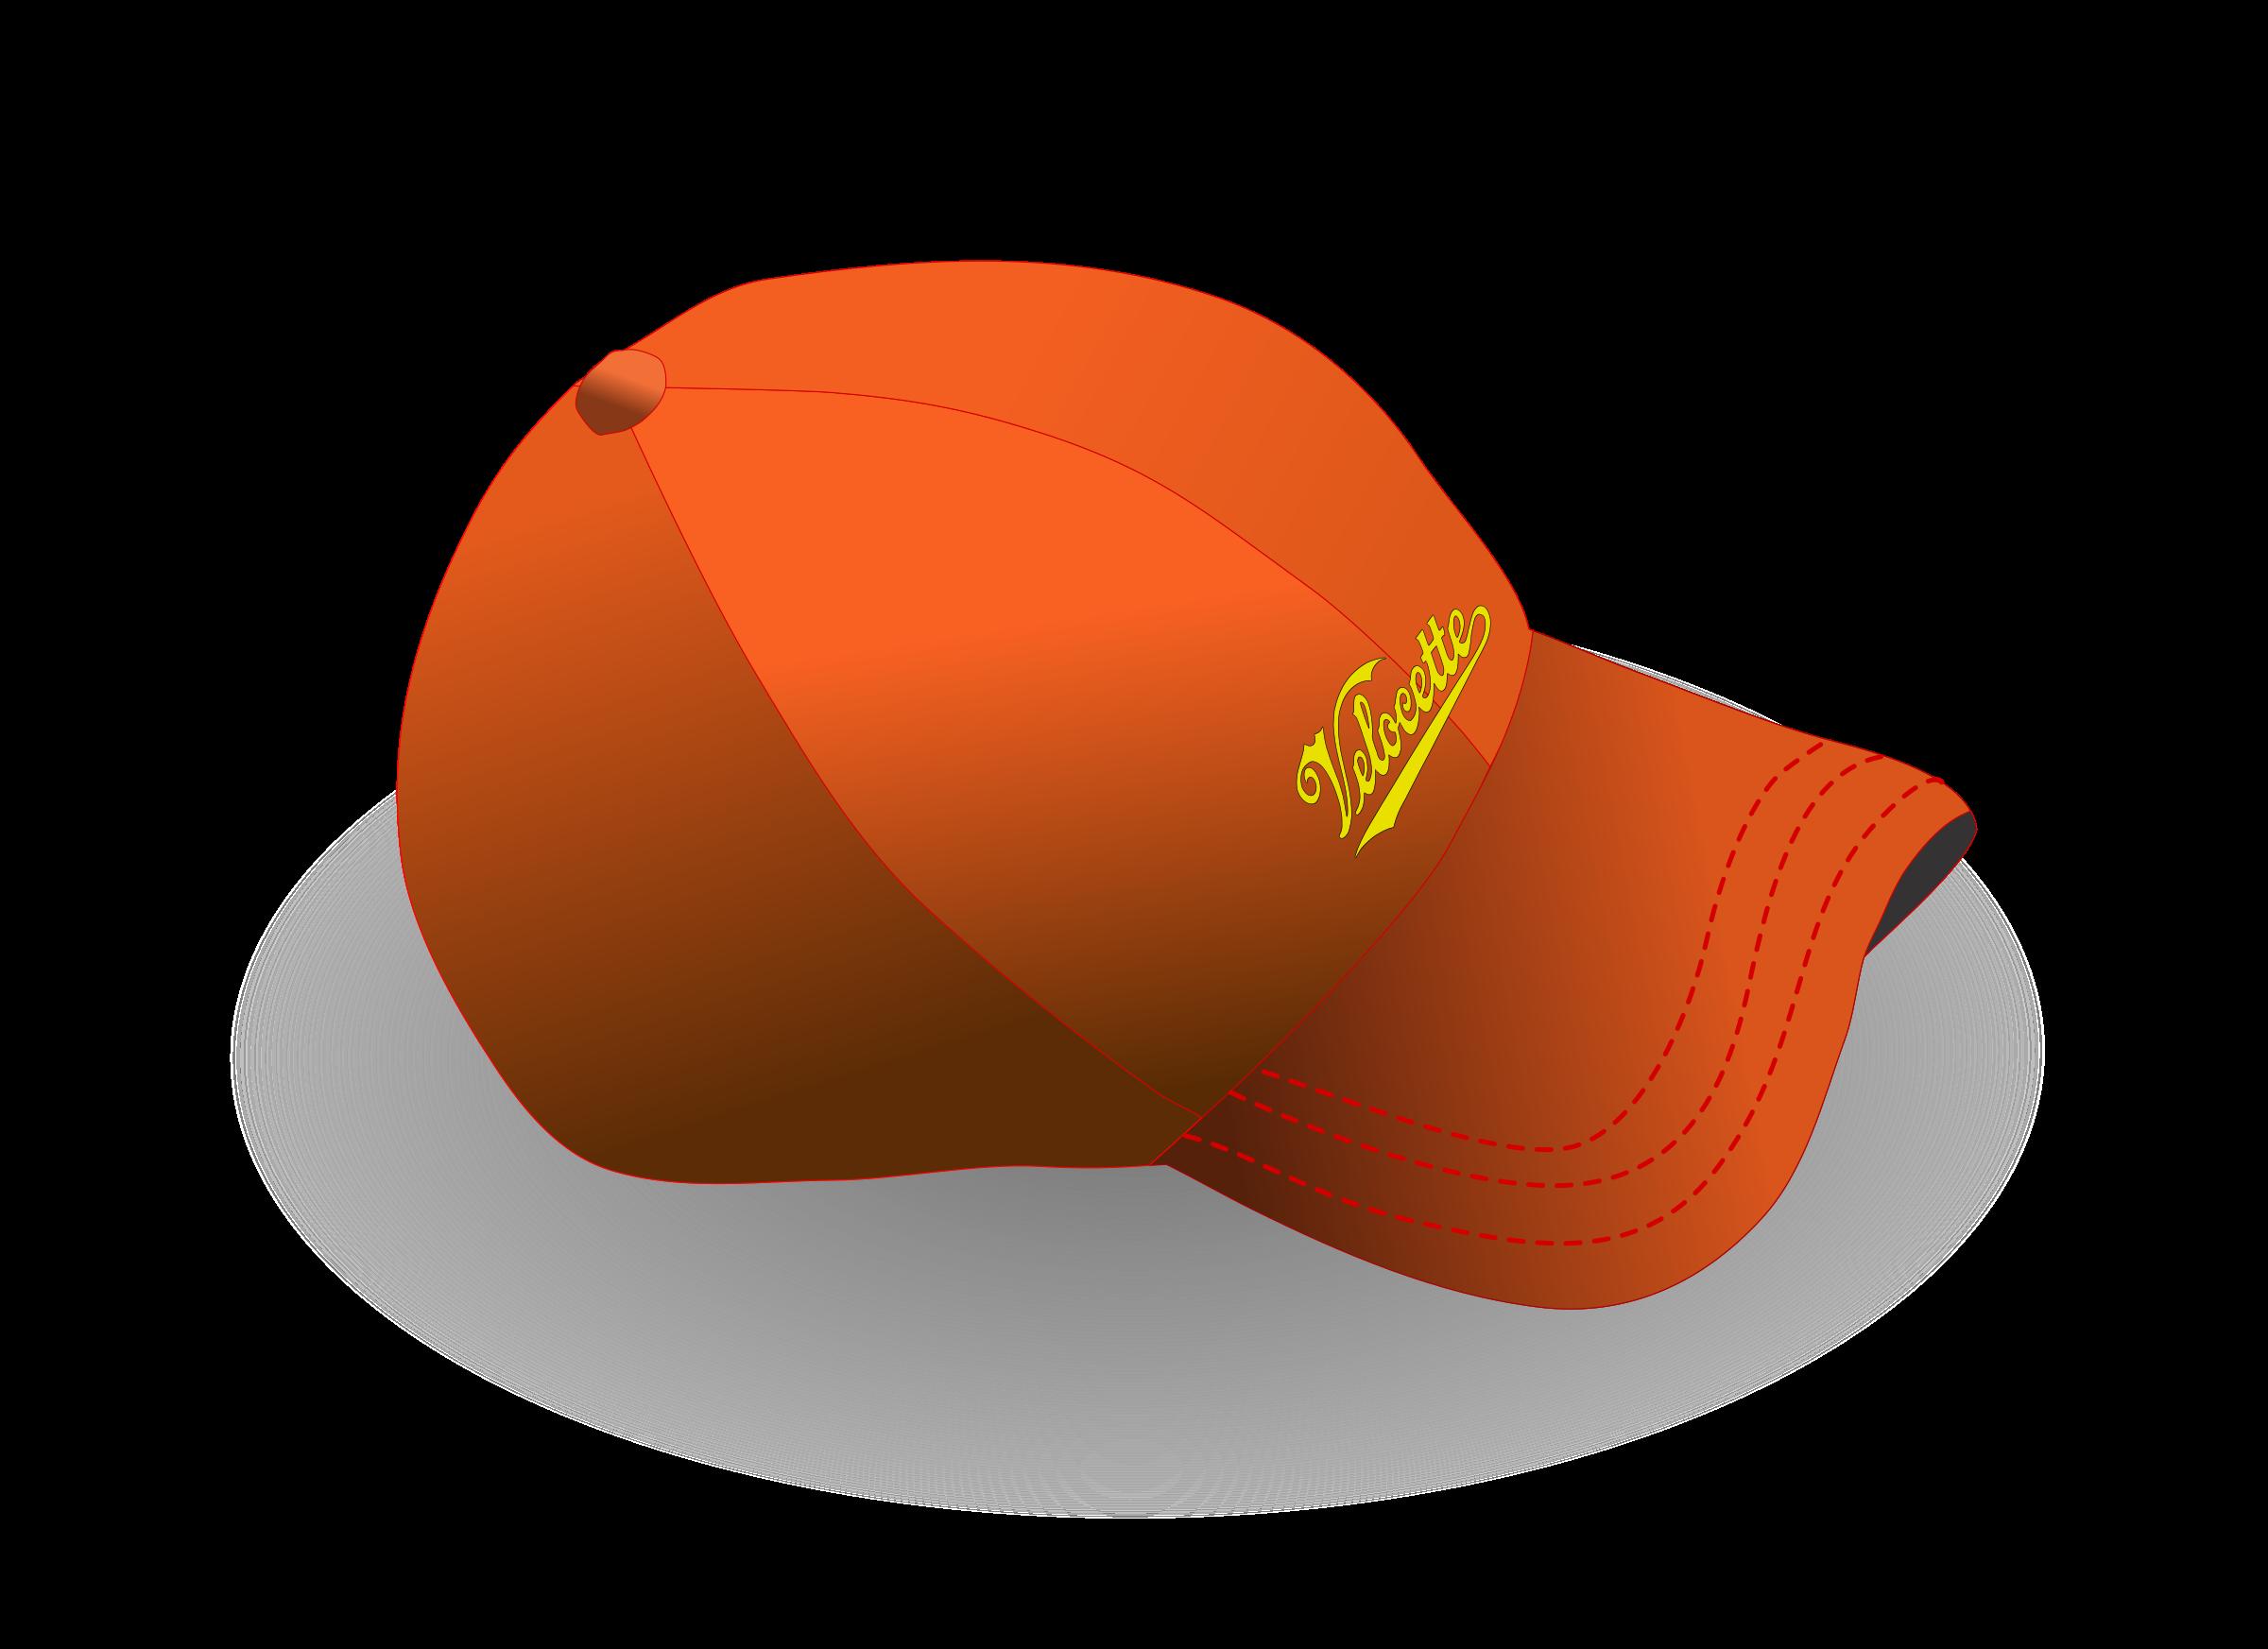 Clipart - Baseball cap